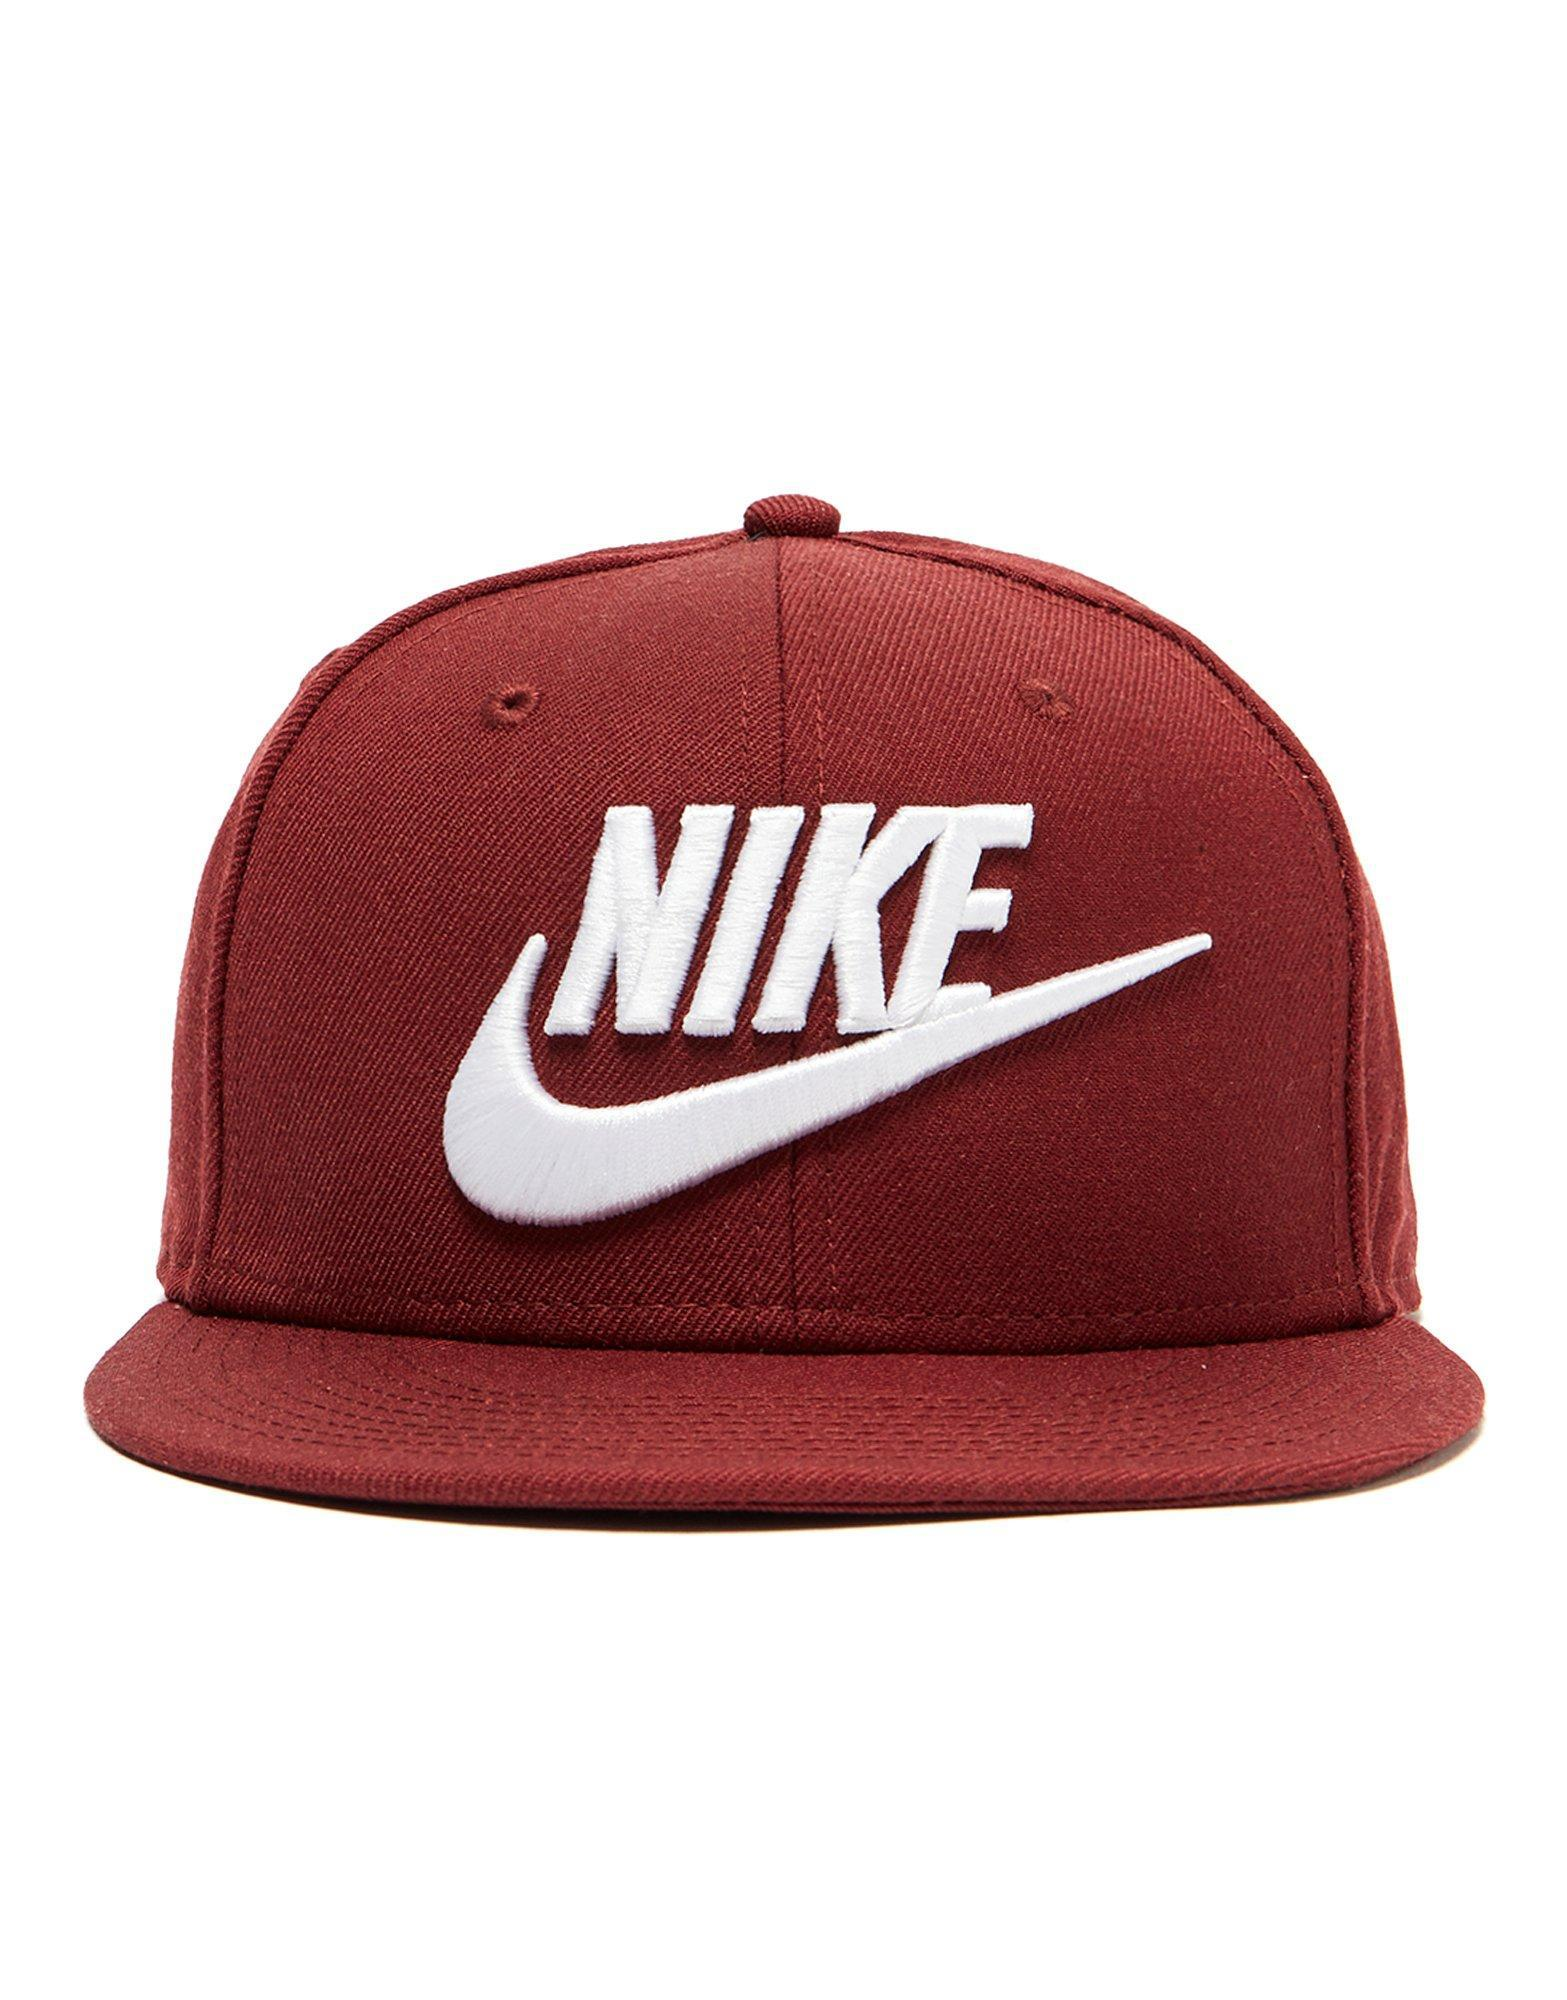 online store 64f7b 90080 ... closeout nike futura true 2 snapback cap in red for men lyst 7eb37 c2df7